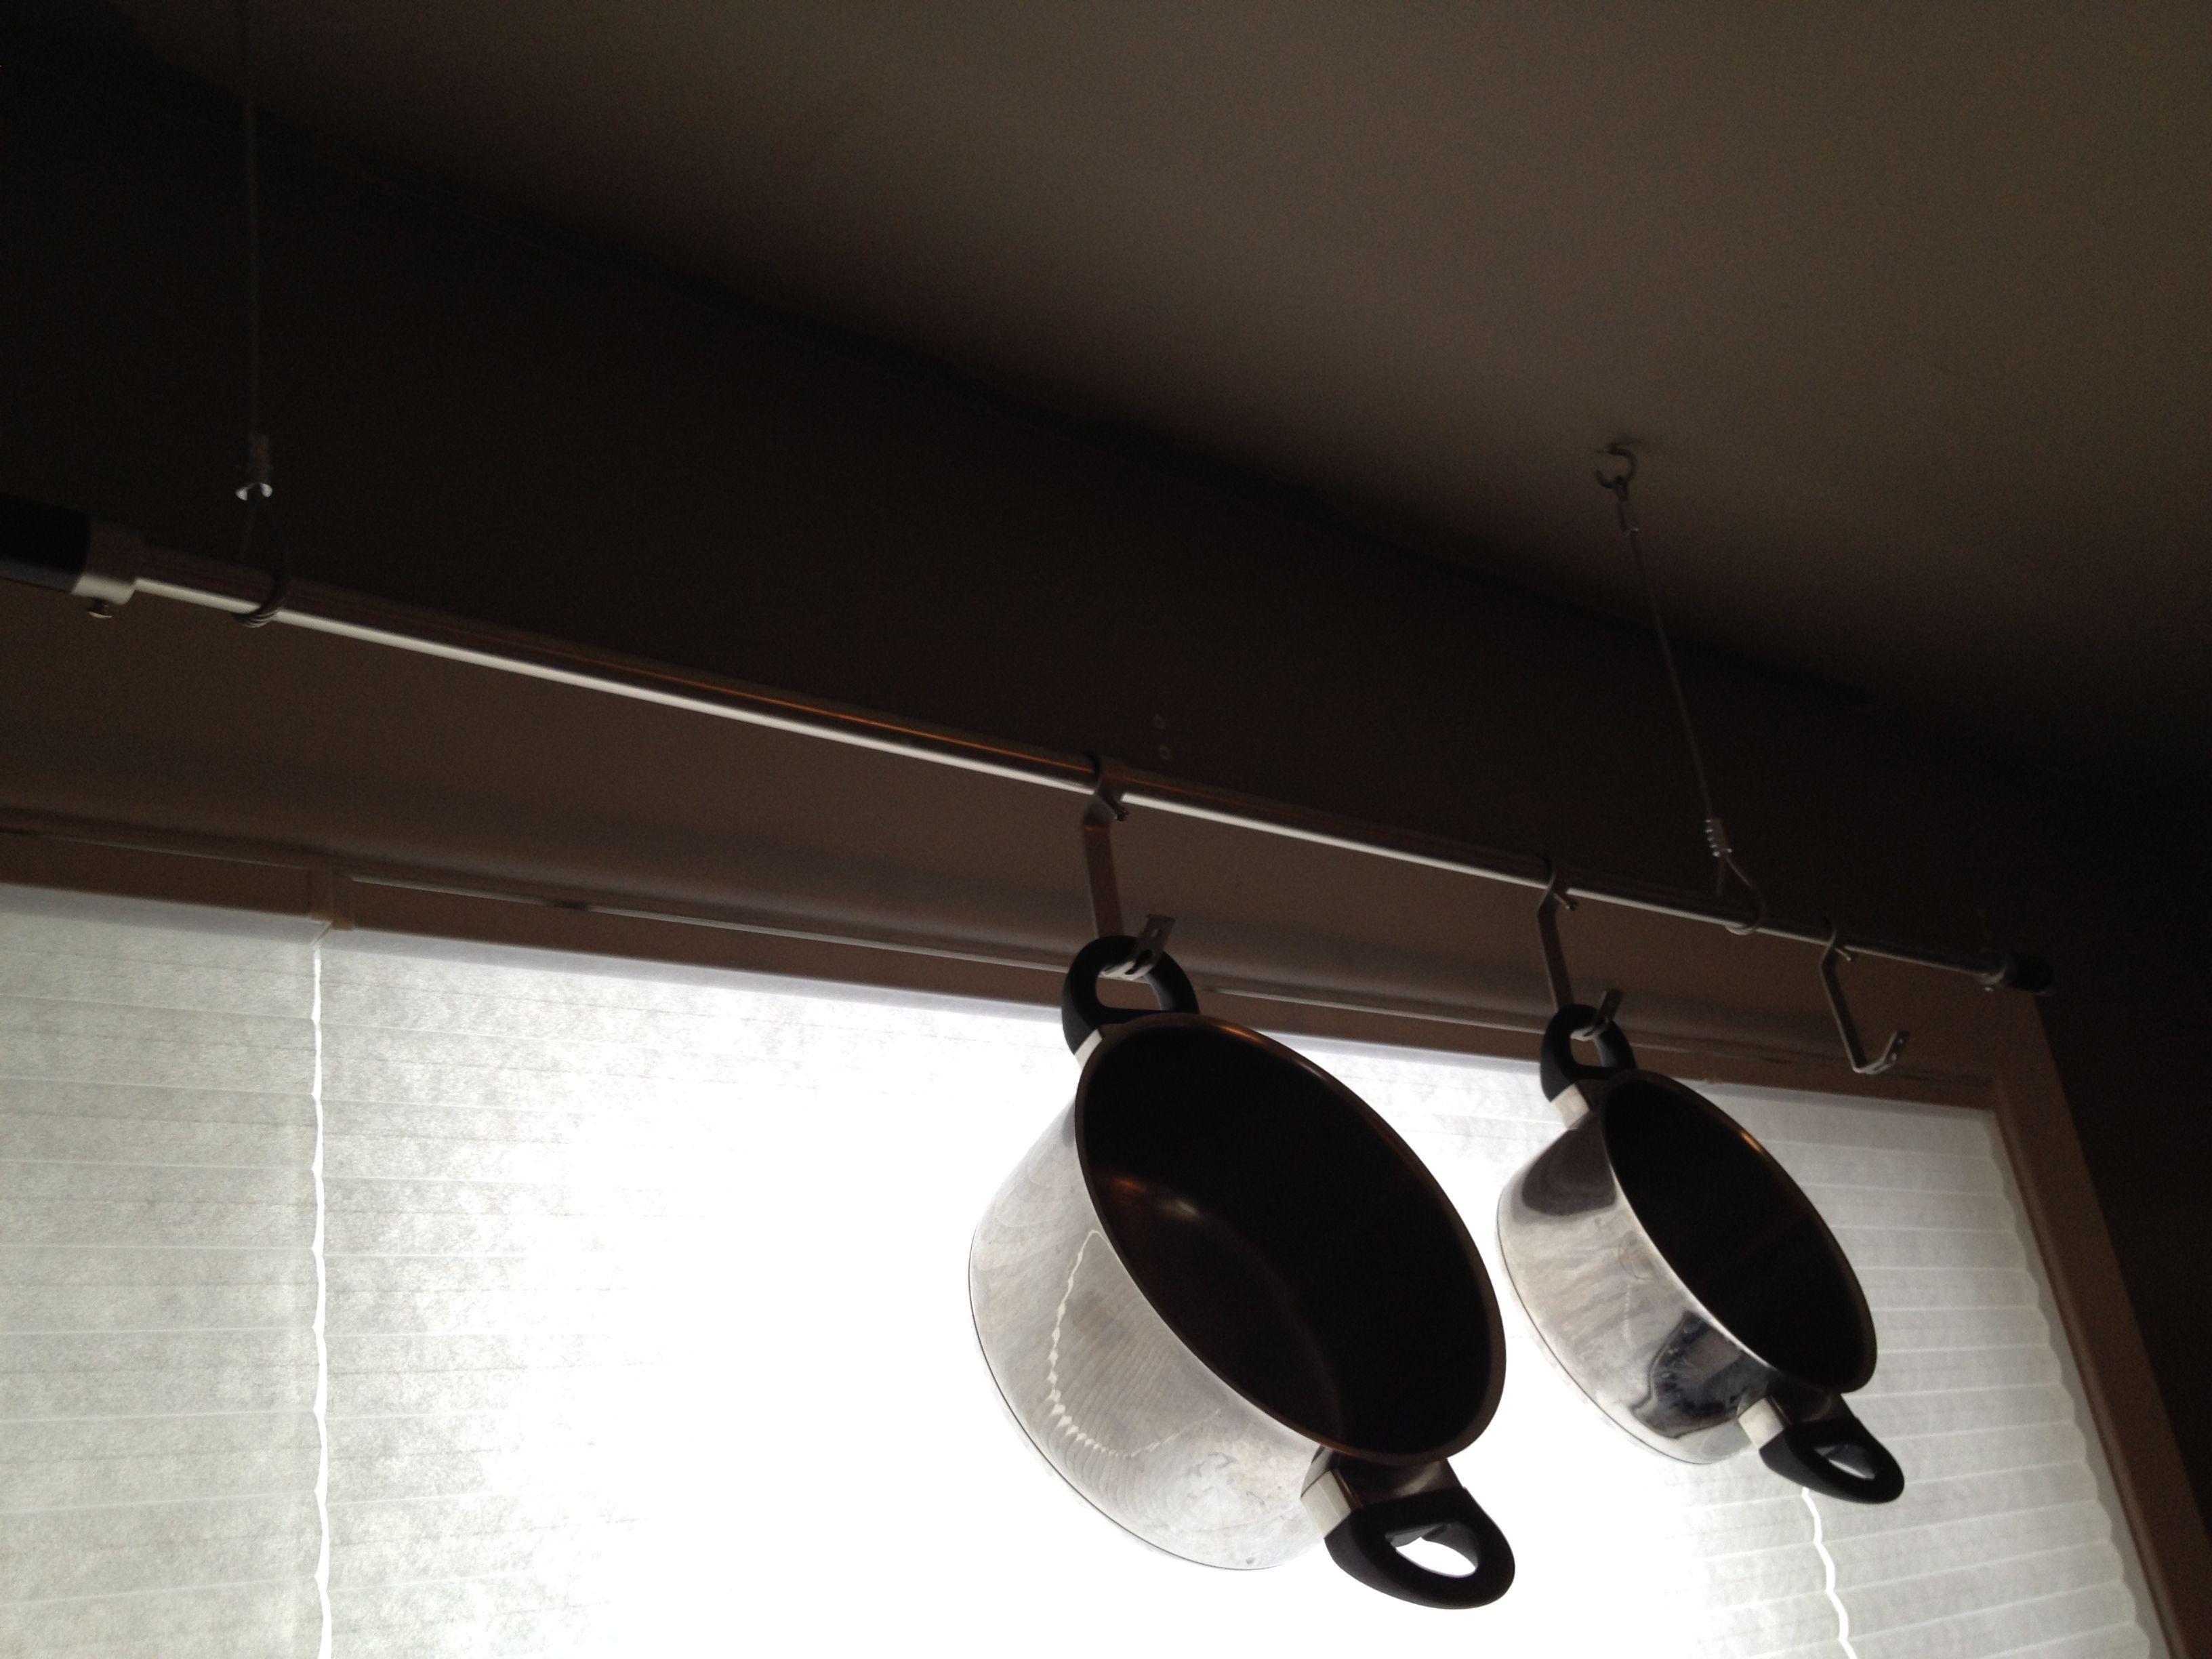 DIY pot holder made from curtain rod